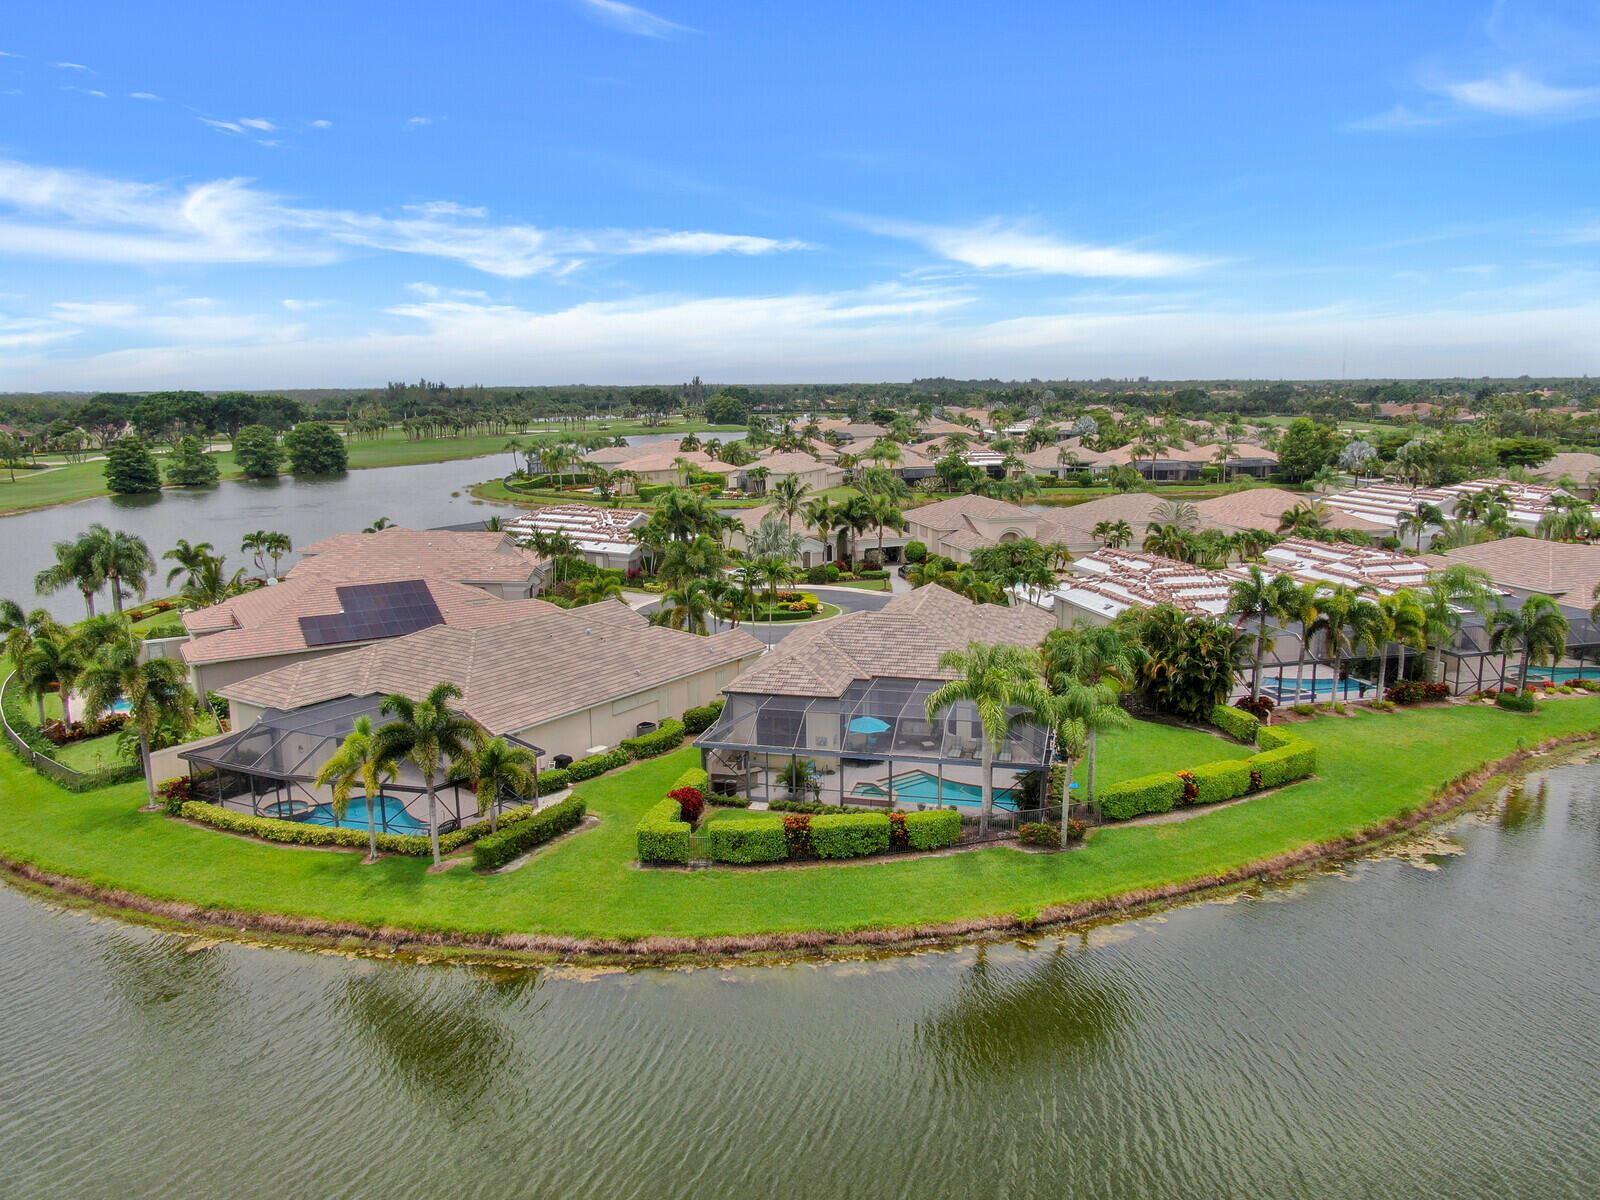 Photo of 7781 Blue Heron Way, West Palm Beach, FL 33412 (MLS # RX-10730745)